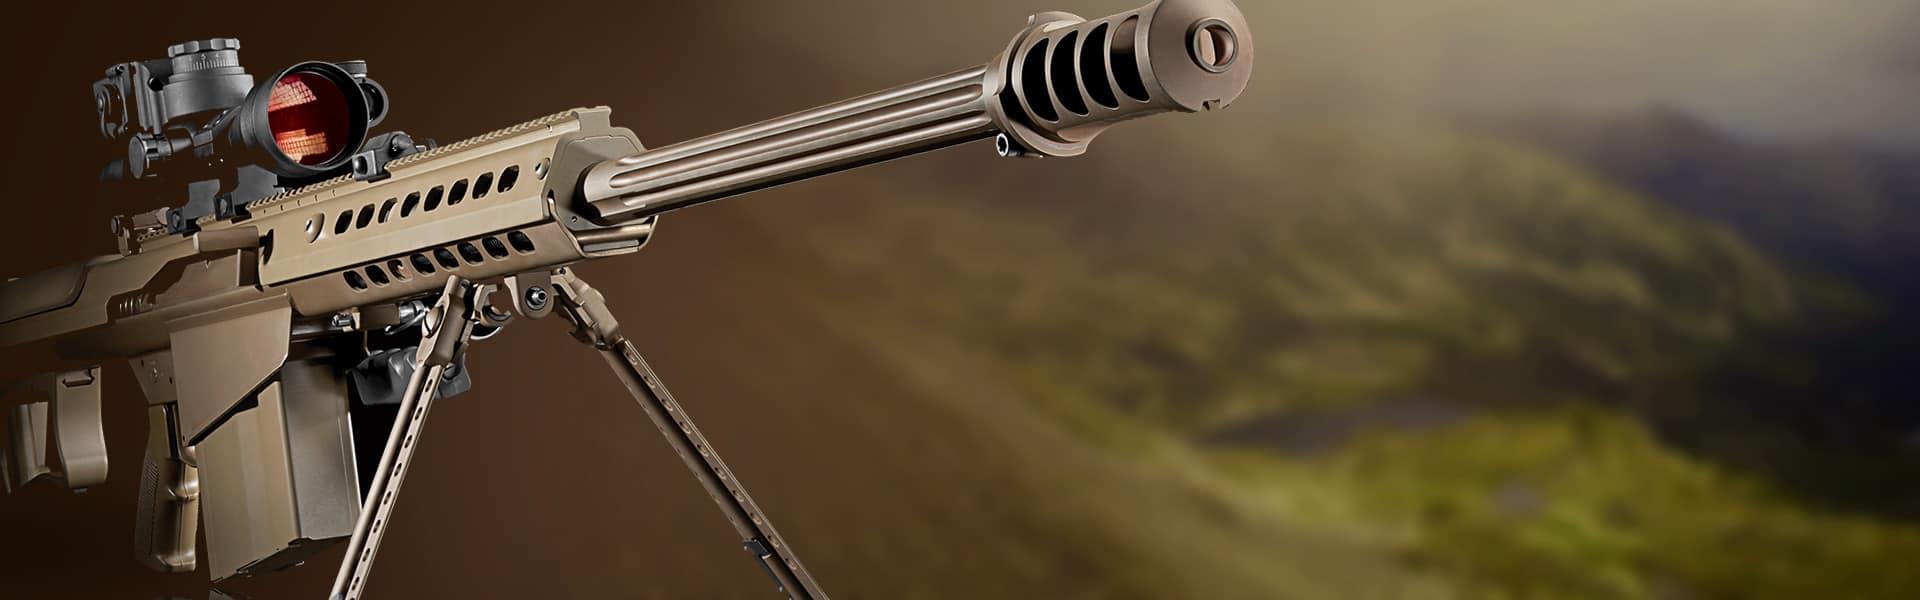 Responsive Website E-commerce and Software Development for Barrett Rifles